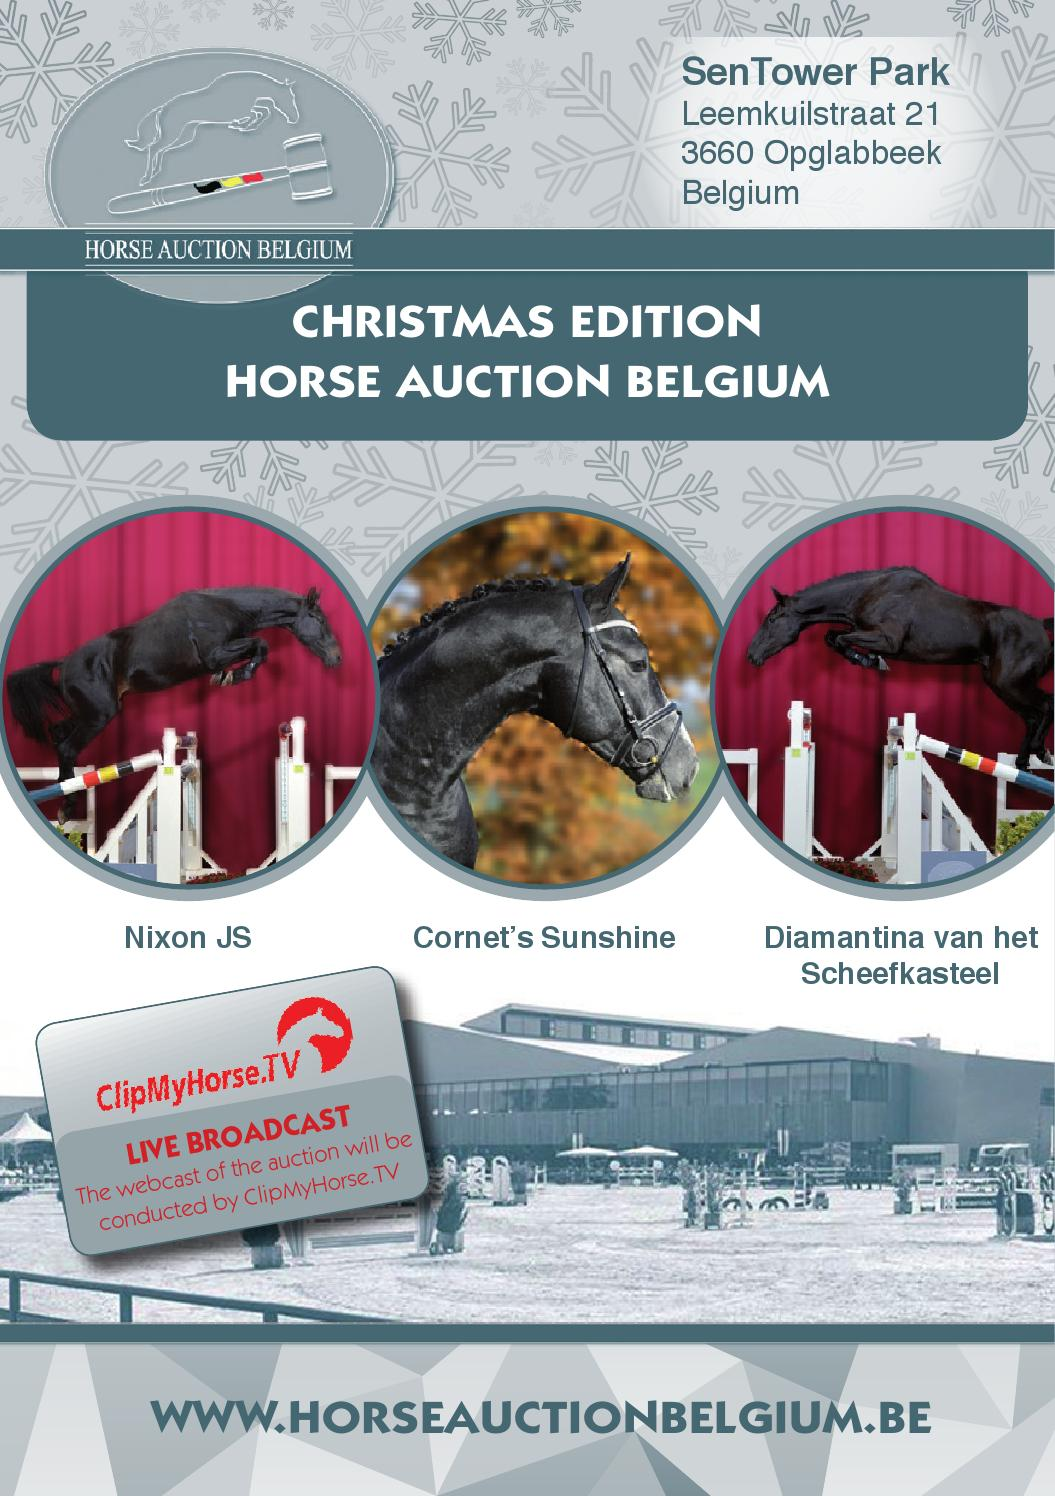 Pweb Solutions Auction Issuu Cataloog Belgium Horse By UzSpVqLMG